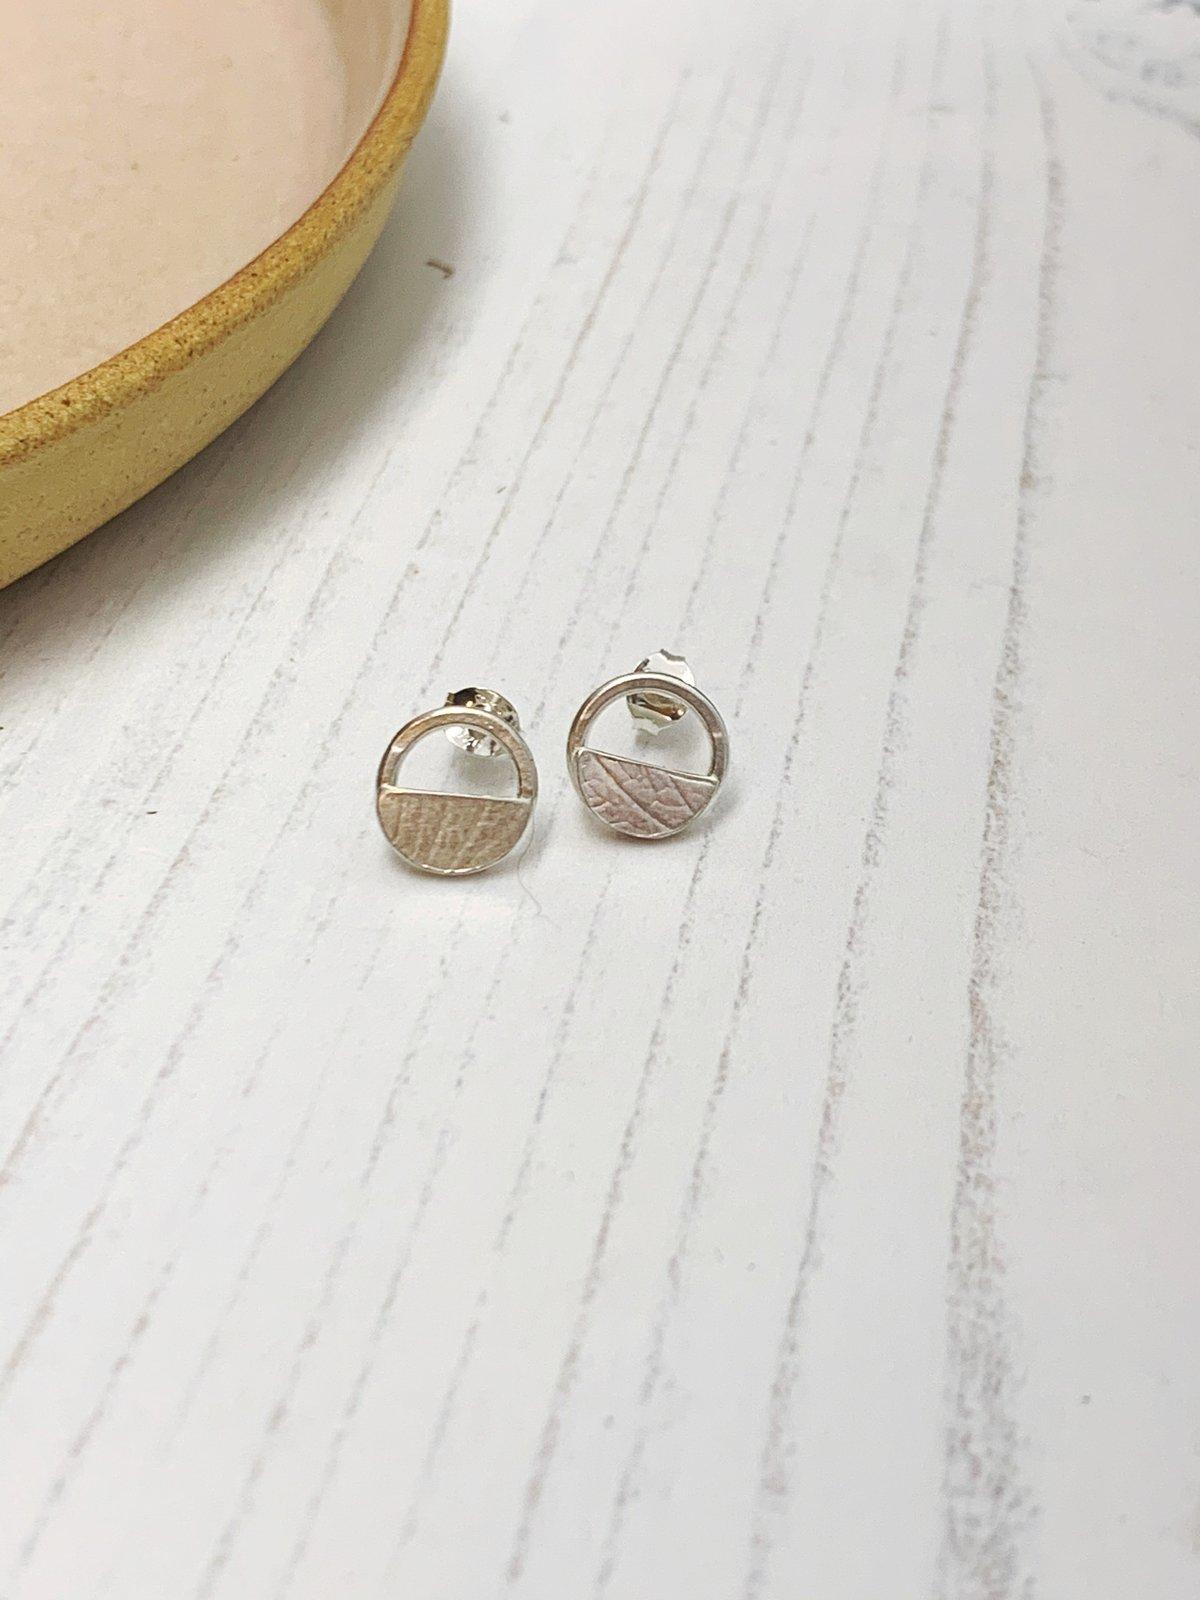 Image of Circle and semi circle stud earrings